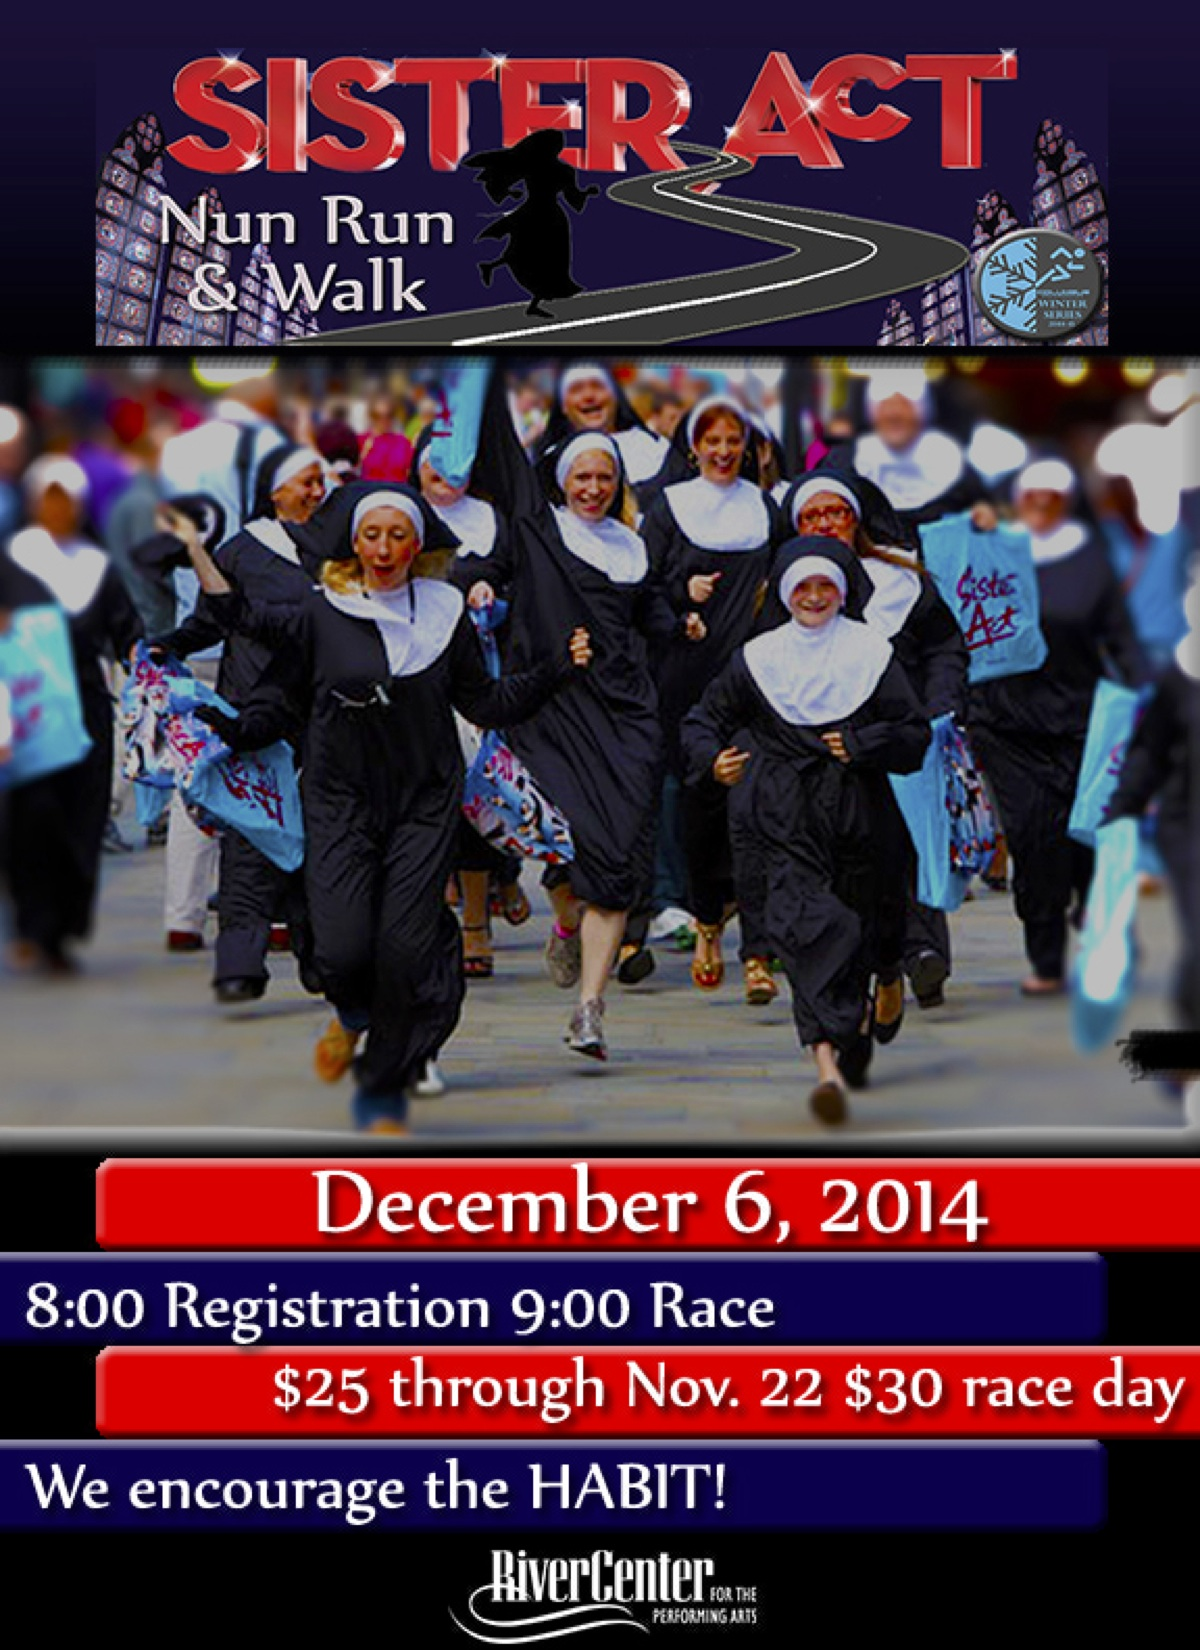 Sister Act Nun Run/Walk Fundraiser